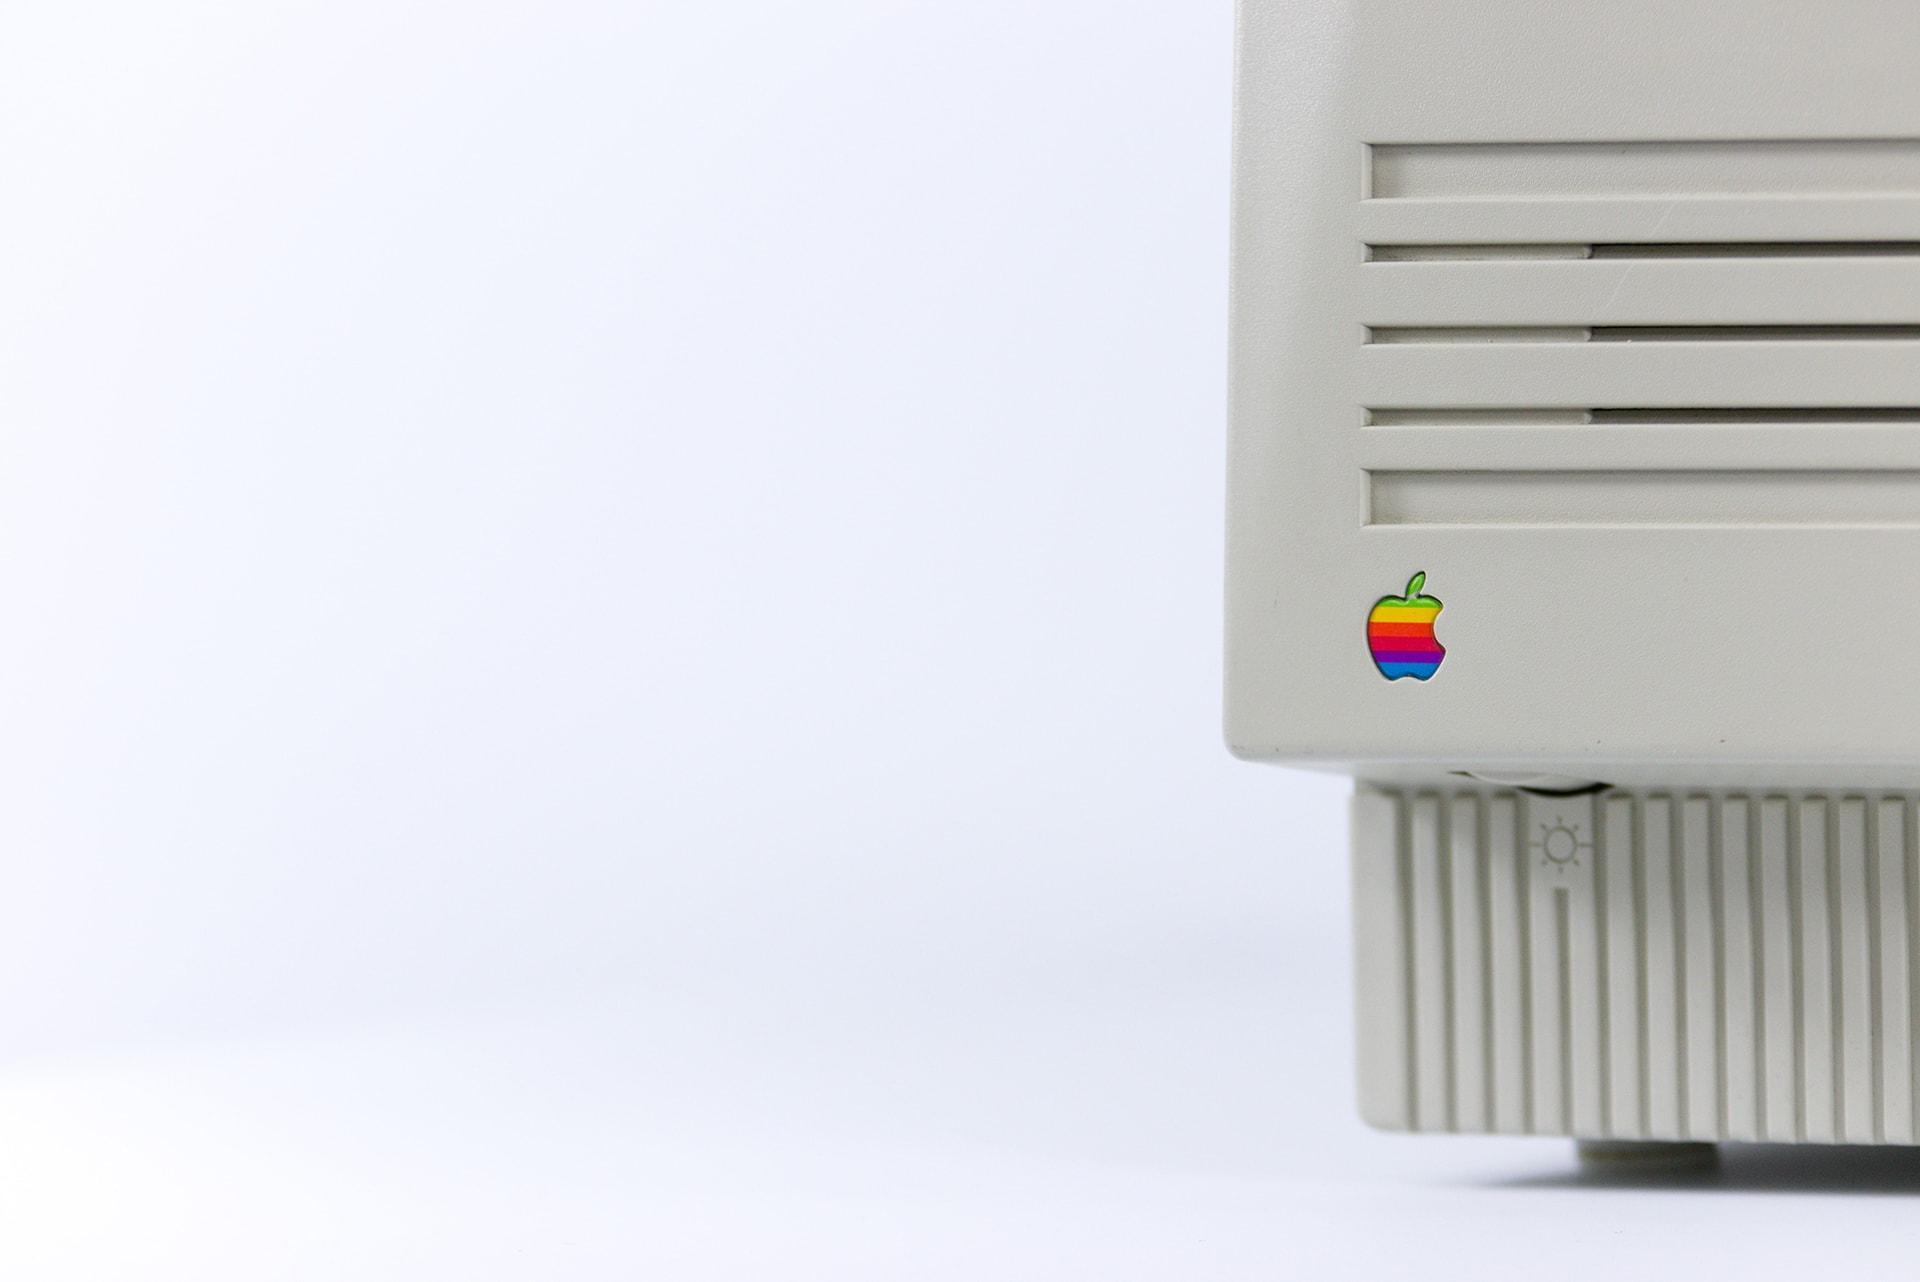 Logo apple na monitorze starego komputera